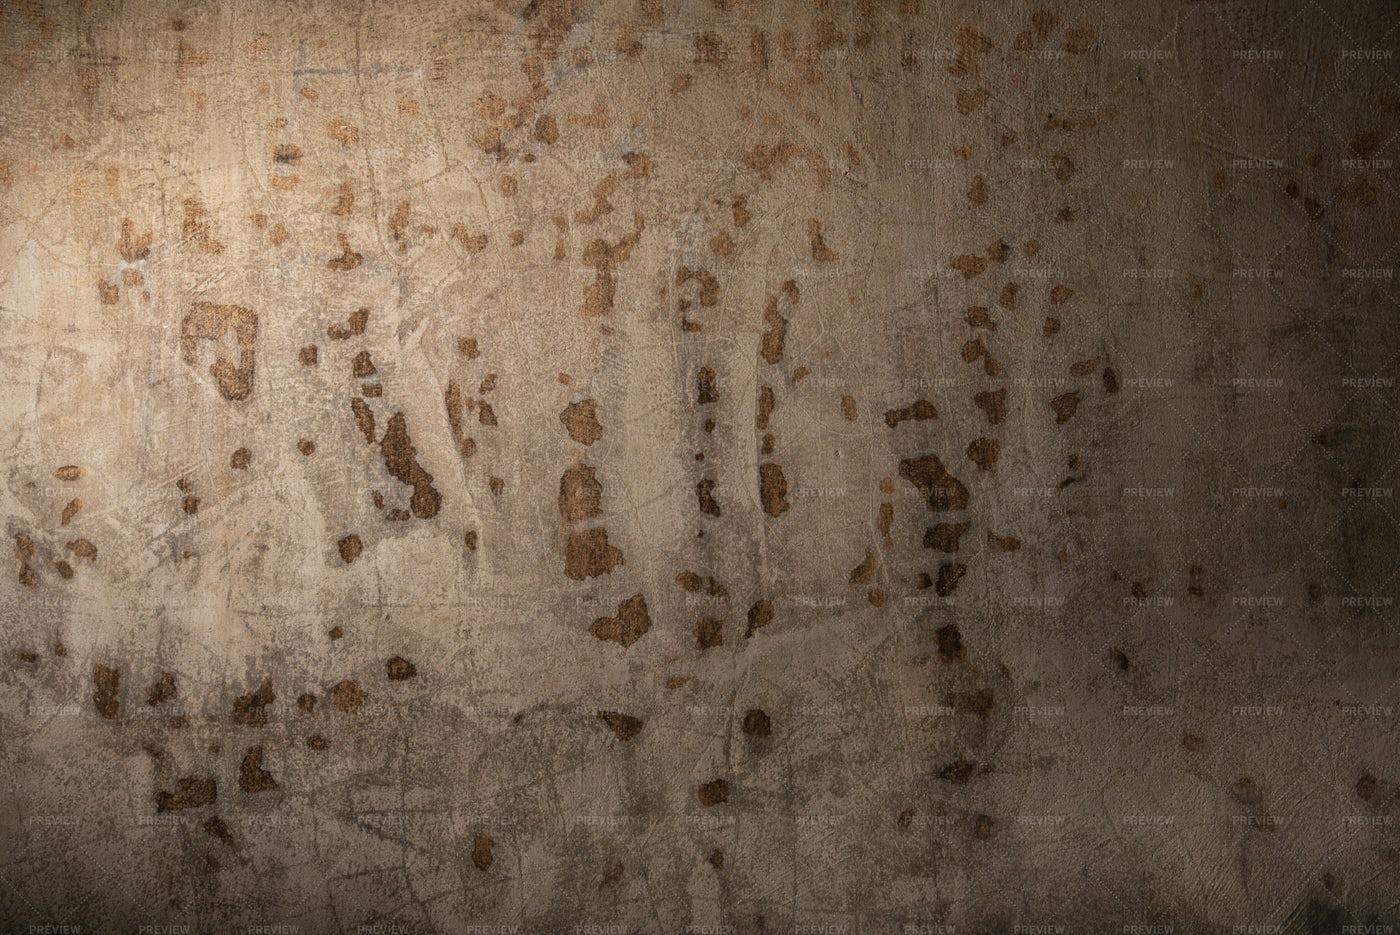 Dirty Wall Texture: Stock Photos